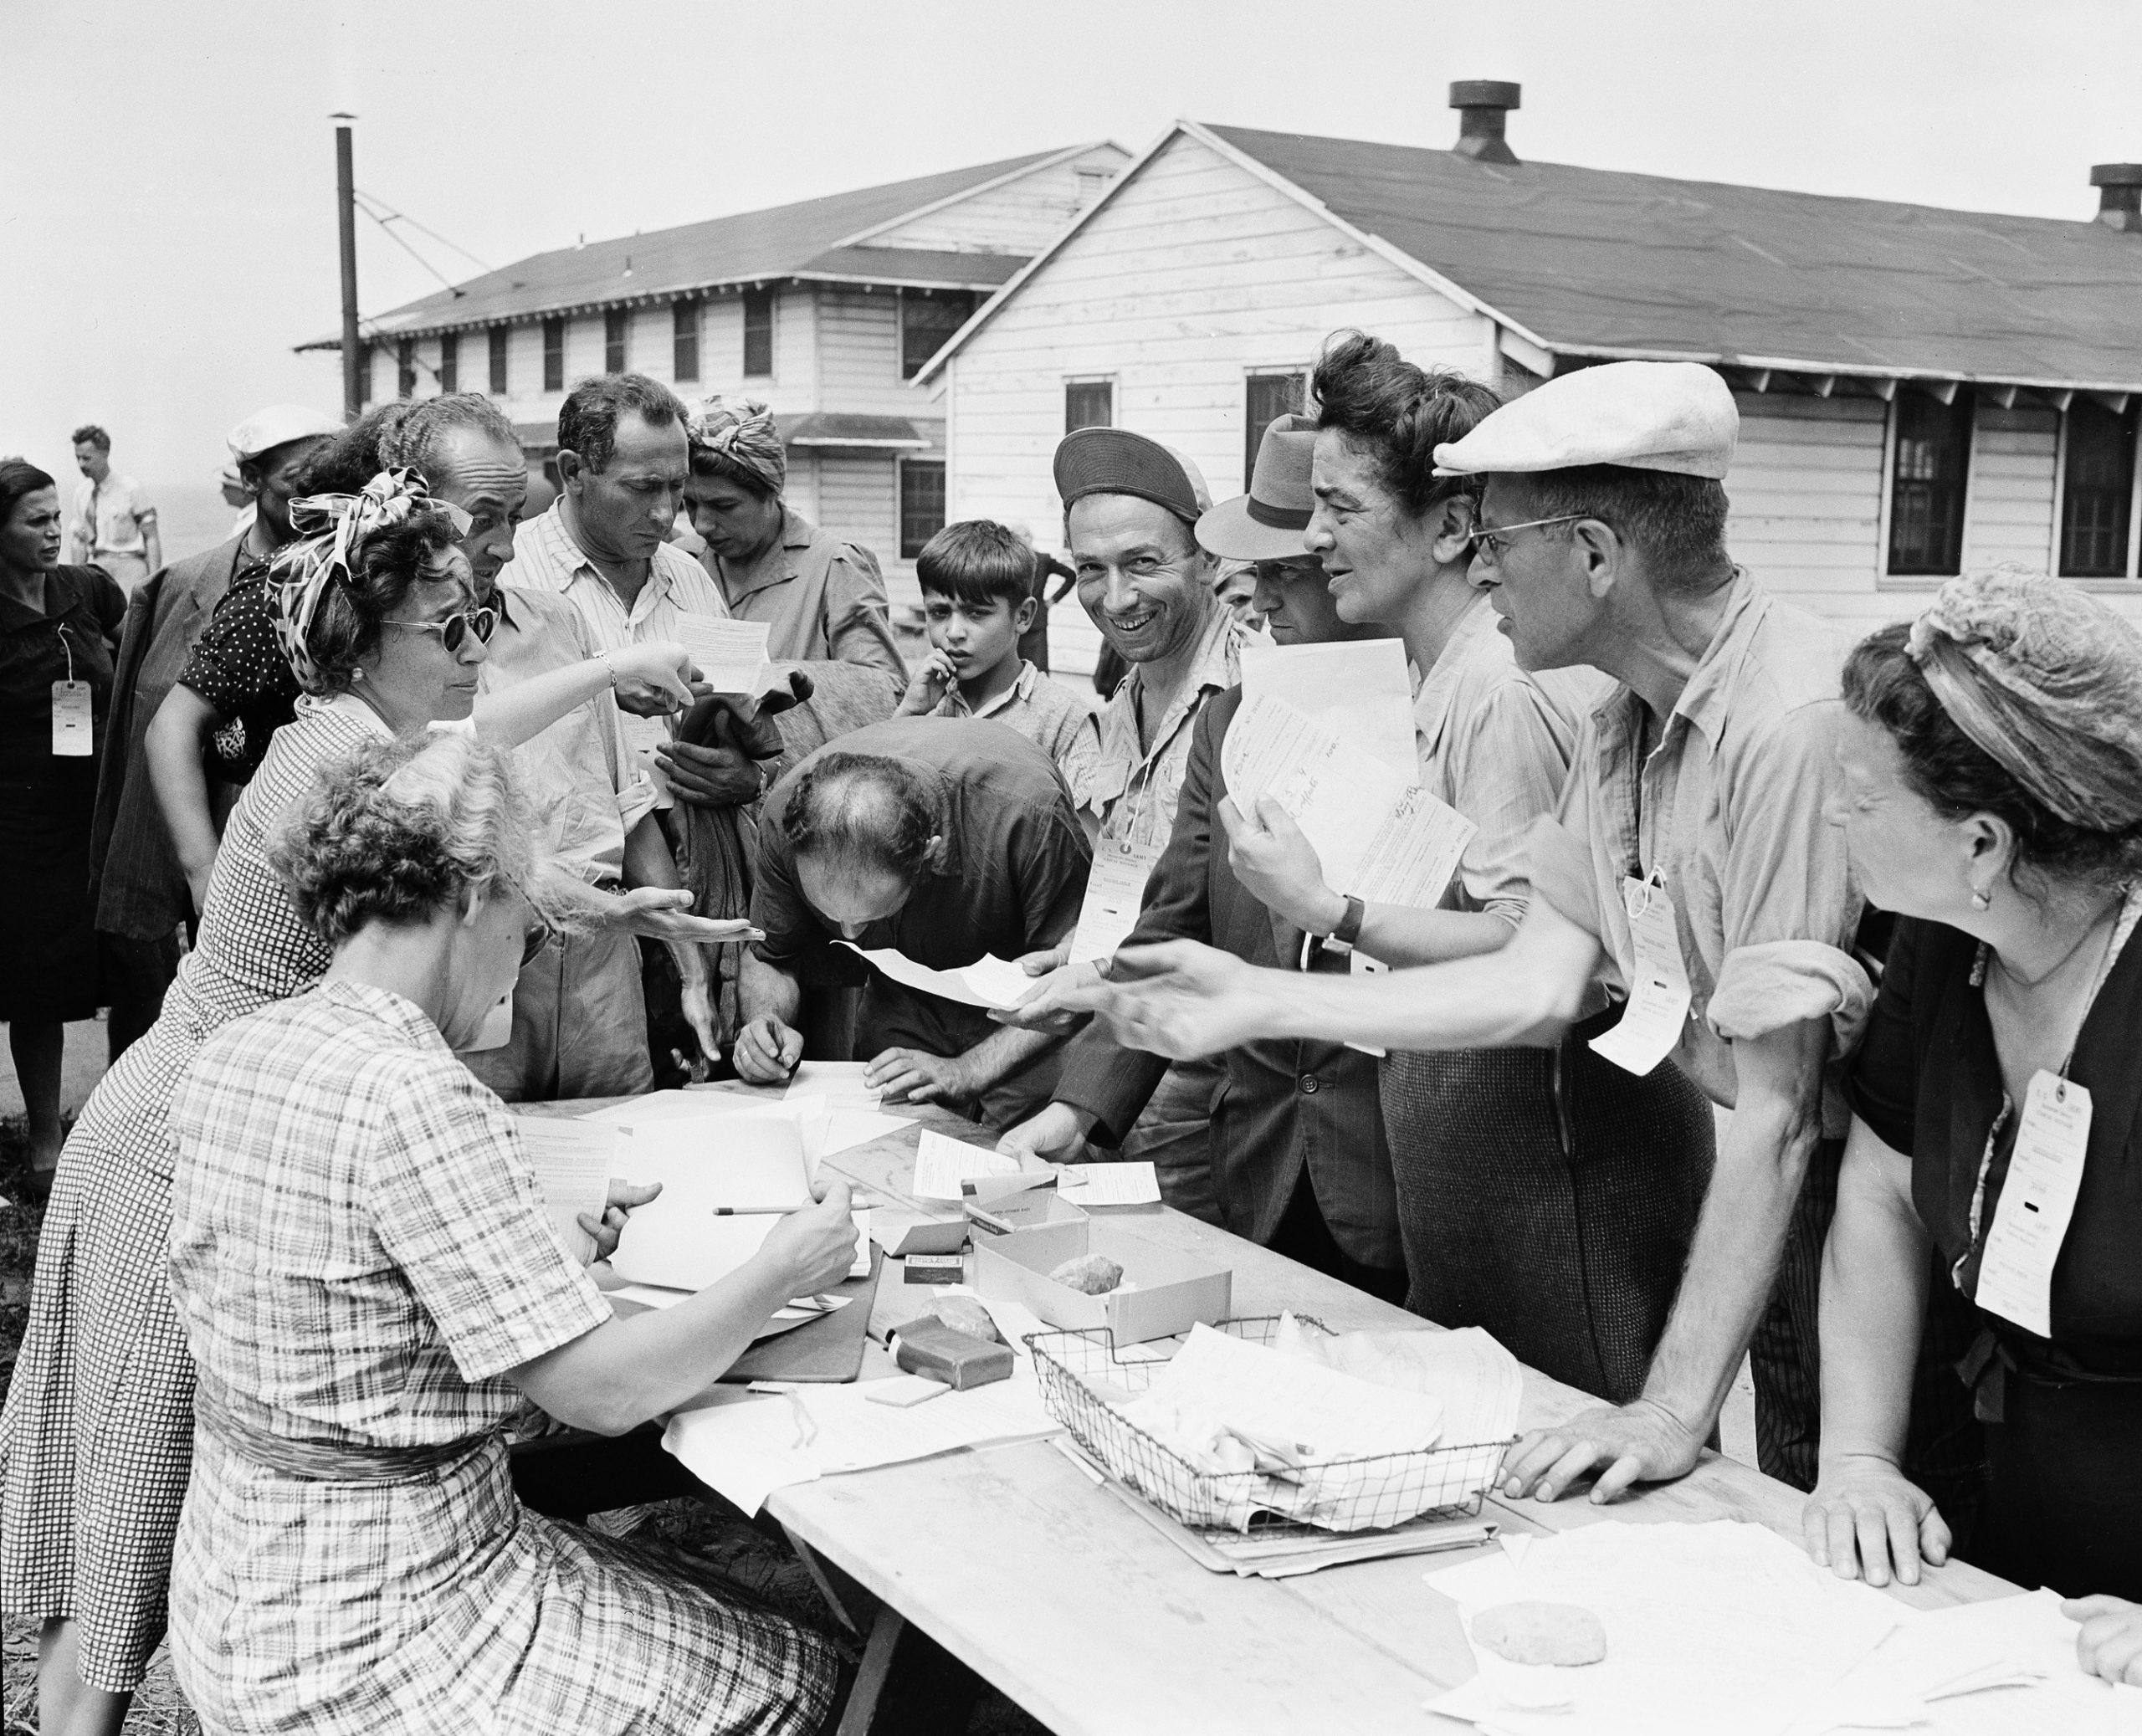 Jewish refugee camp US